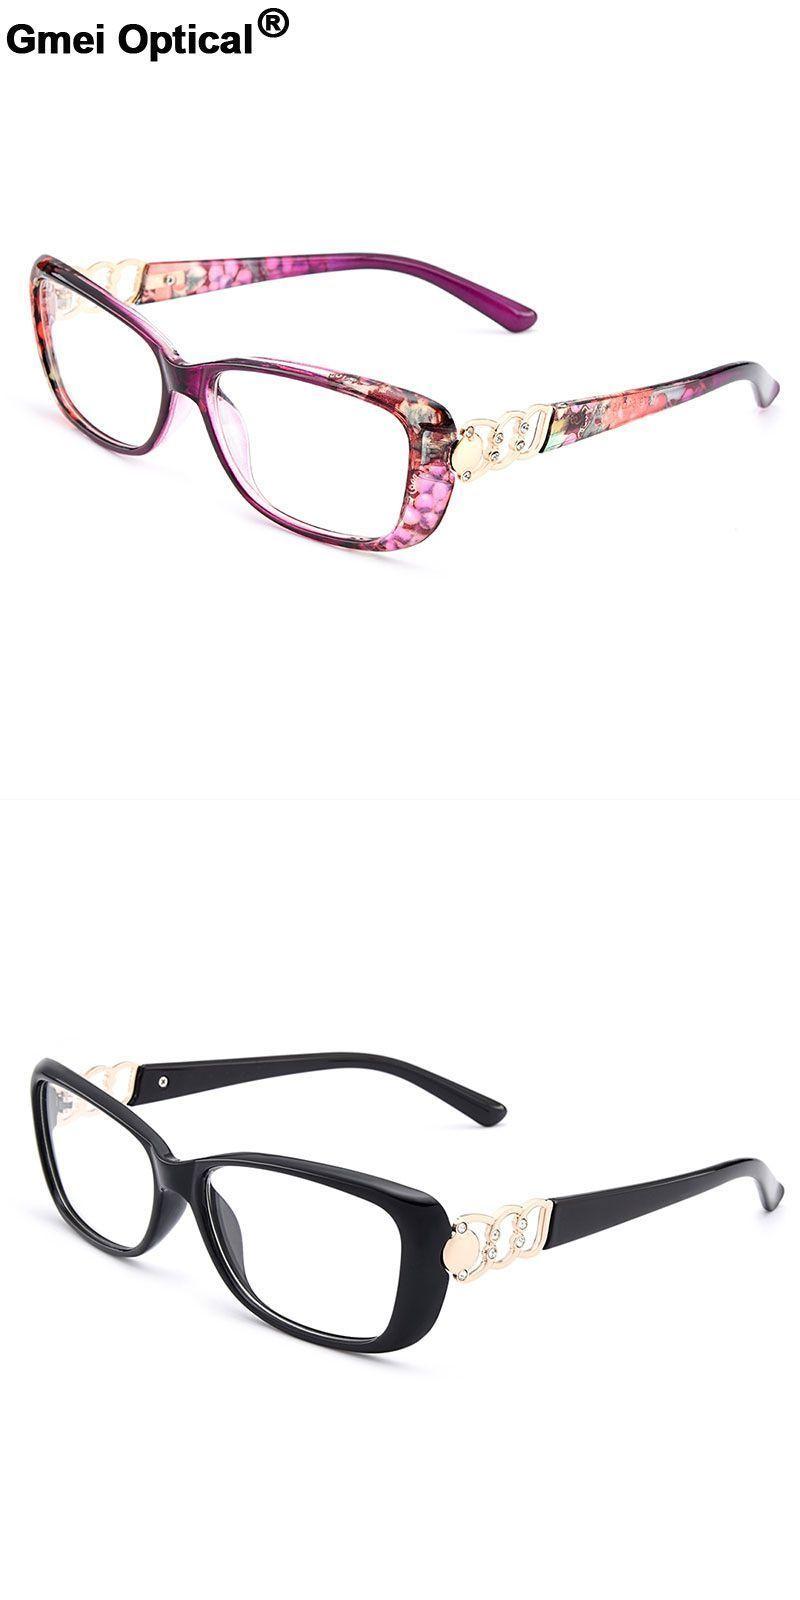 e3e3c6bf26 New arrival colorful women full rim optical eyeglasses frames female urltra-light  tr90 plastic myopia eyewear m1379  eyewear  accessories  frames  women ...